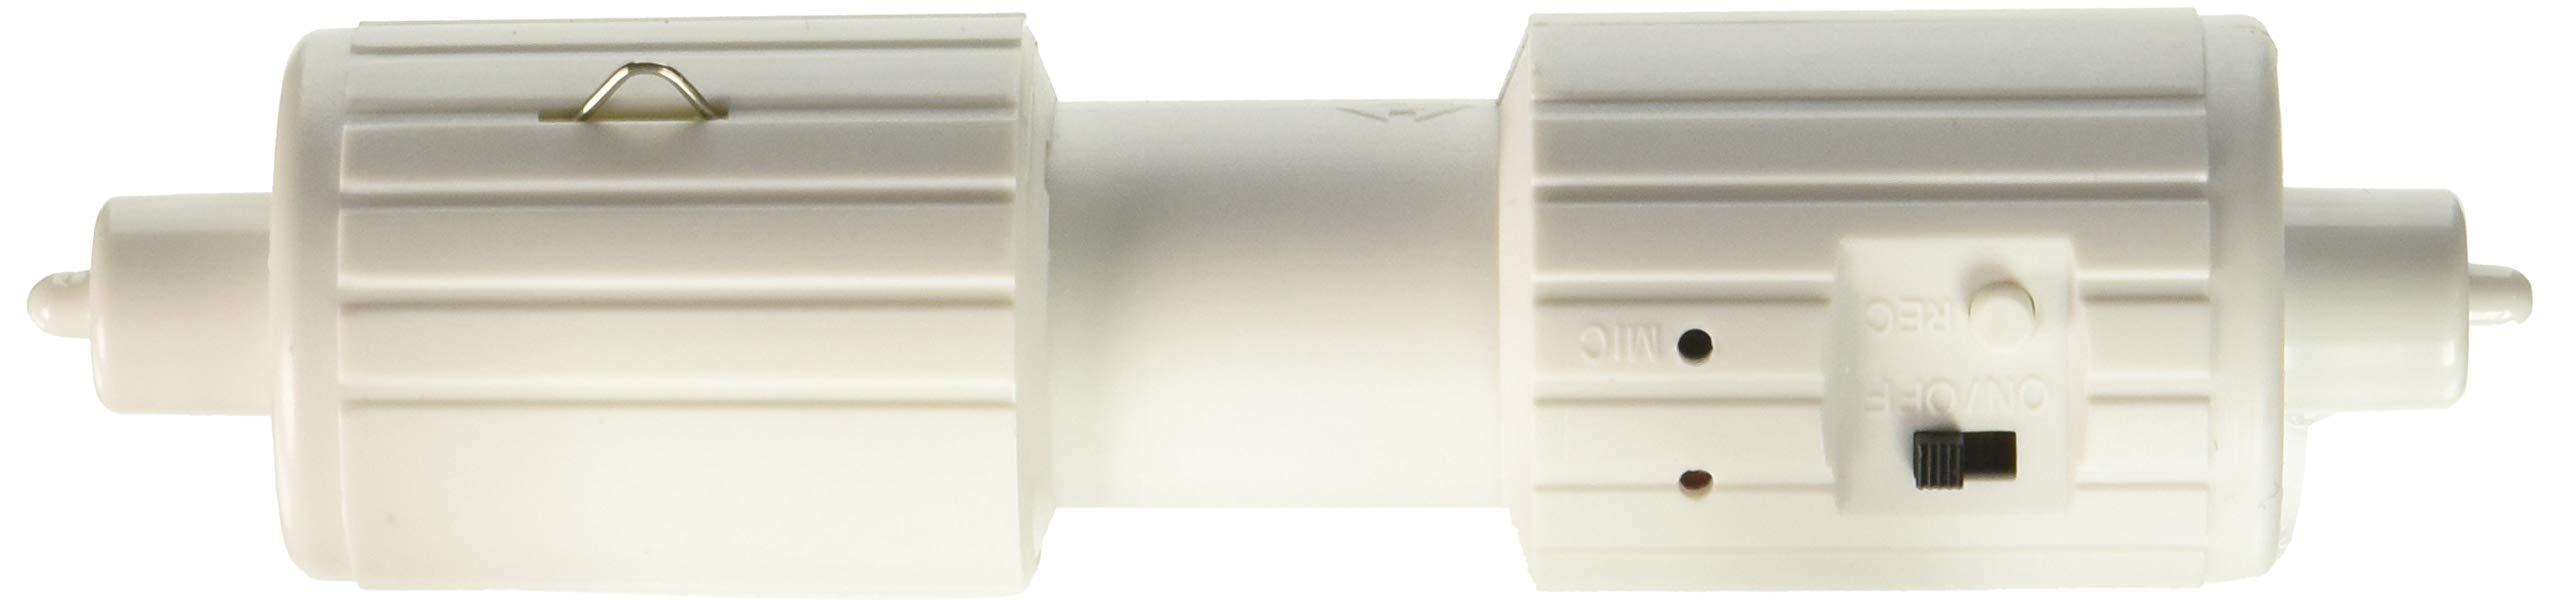 Amazon Com 4 Rolls Gag Gift Novelty Toilet Paper